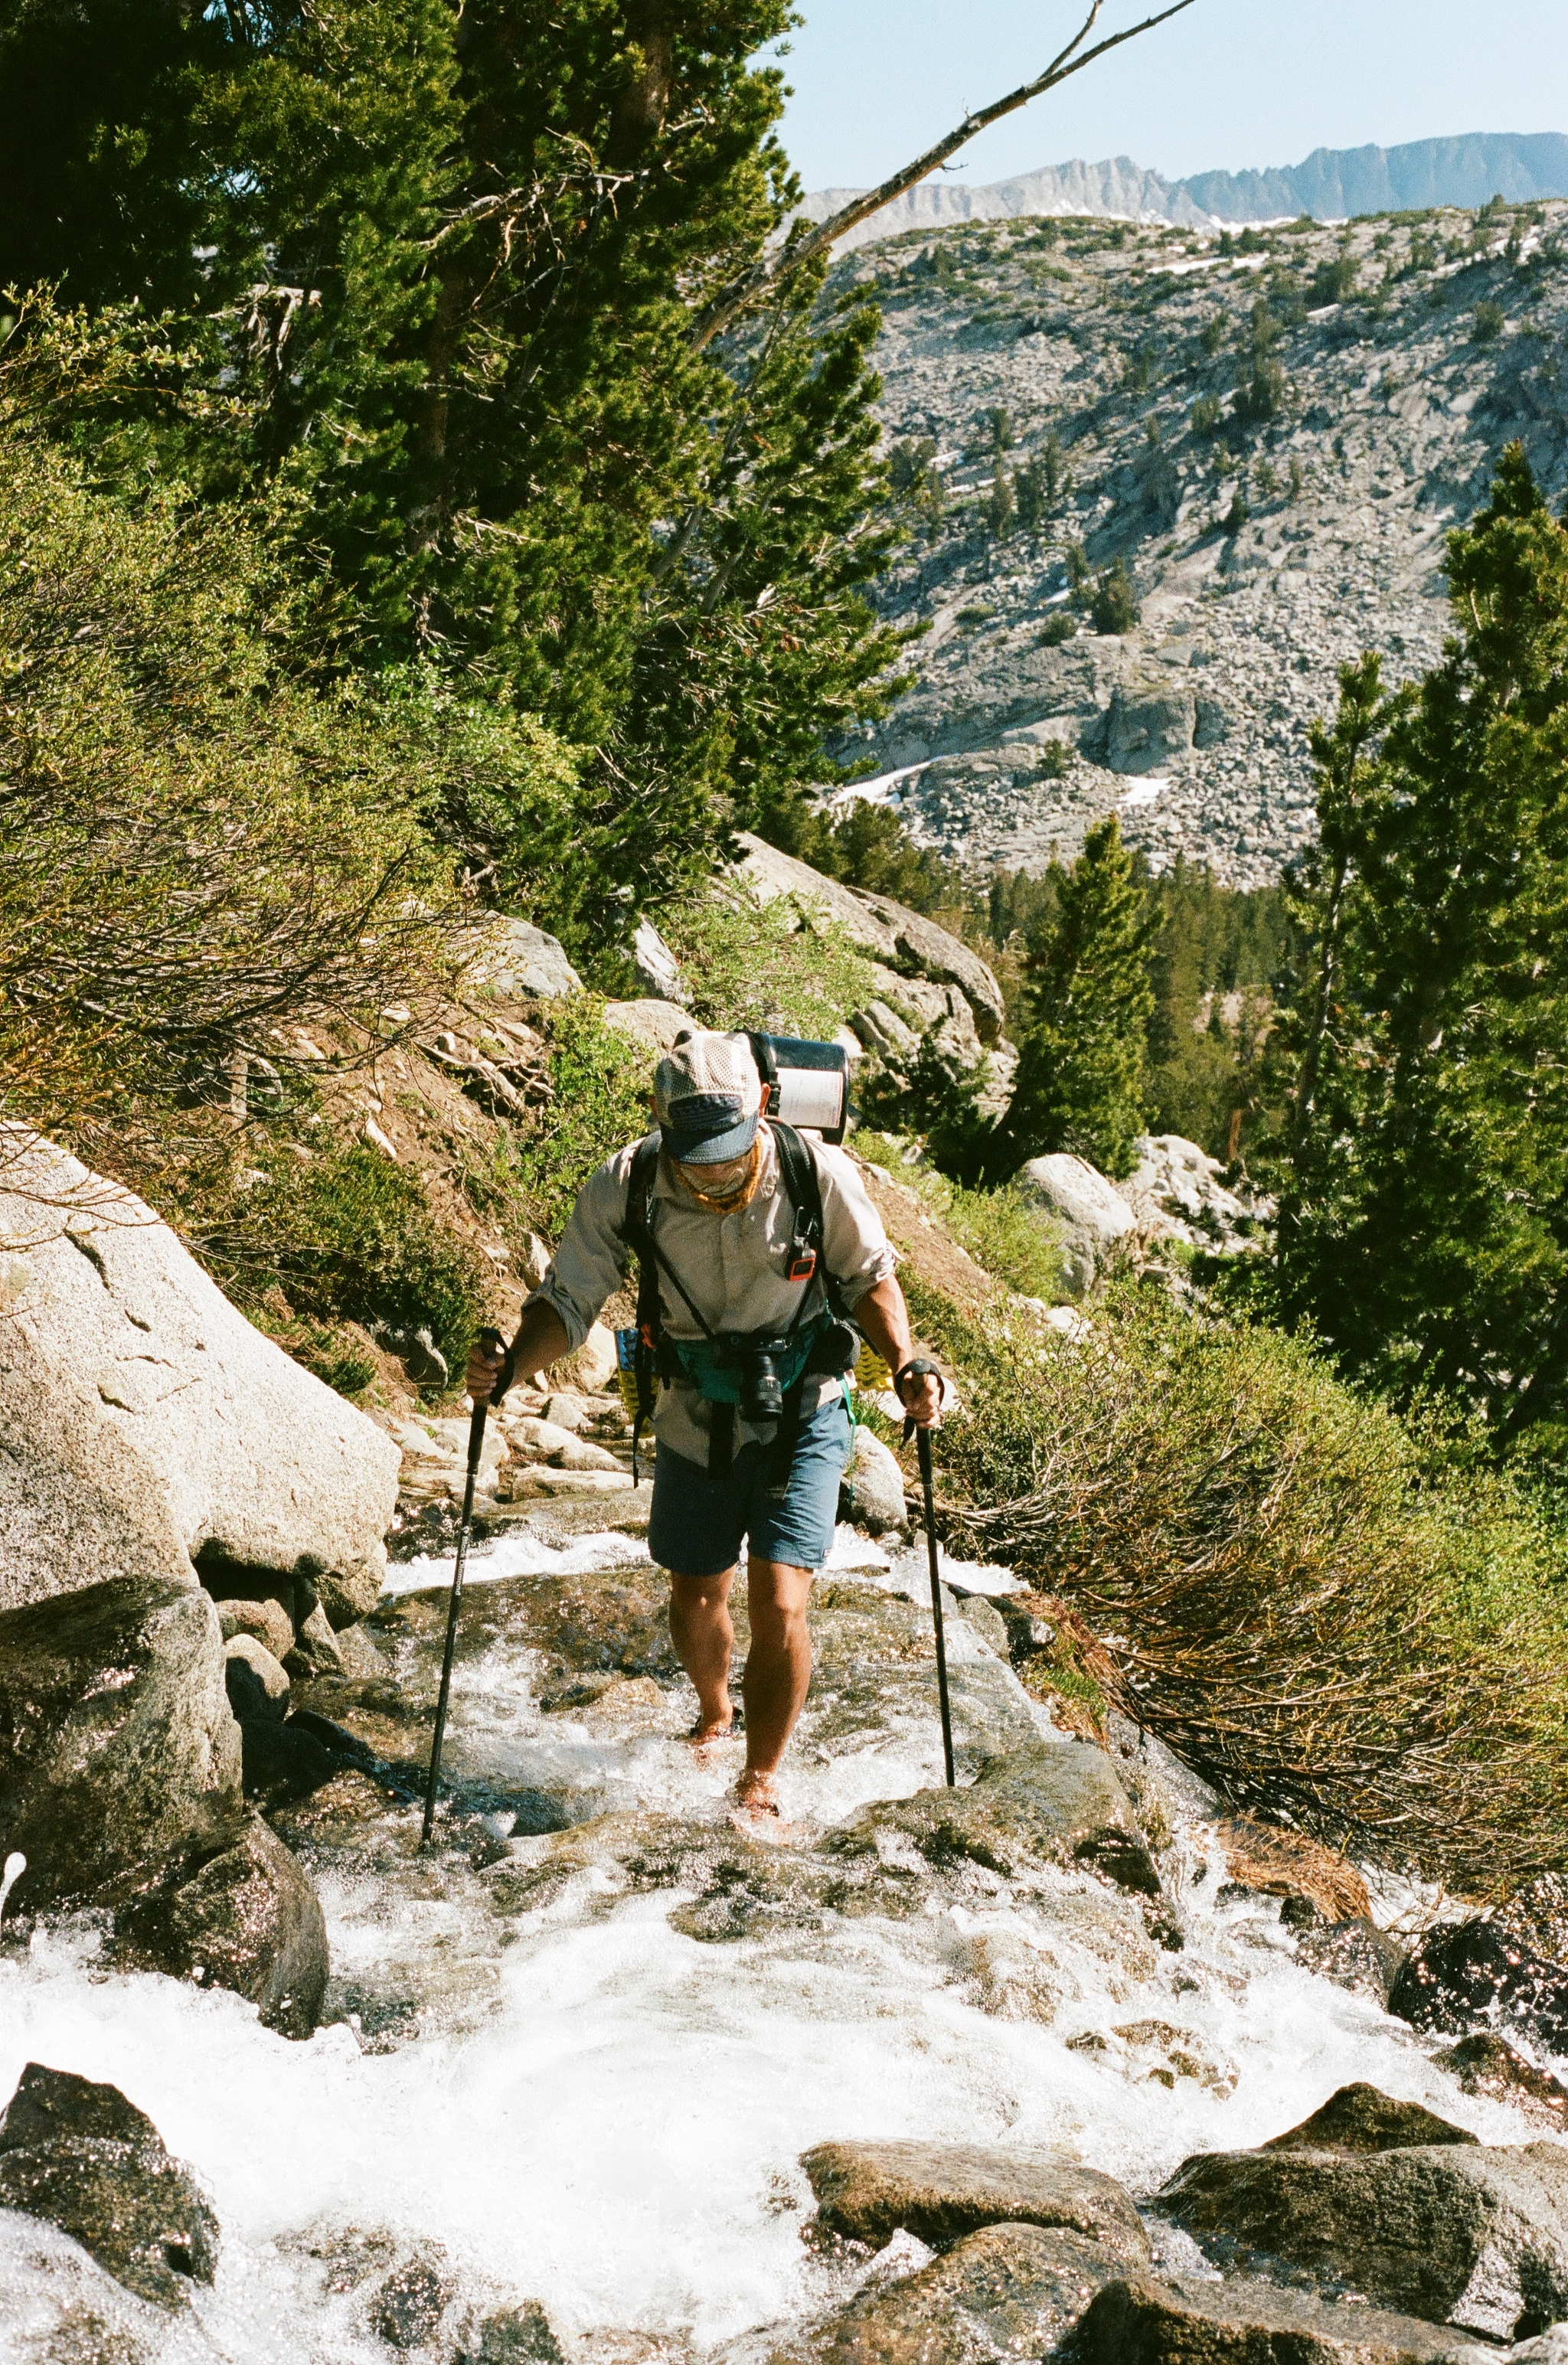 Owen crossing water near Donohue Pass, 35mm film